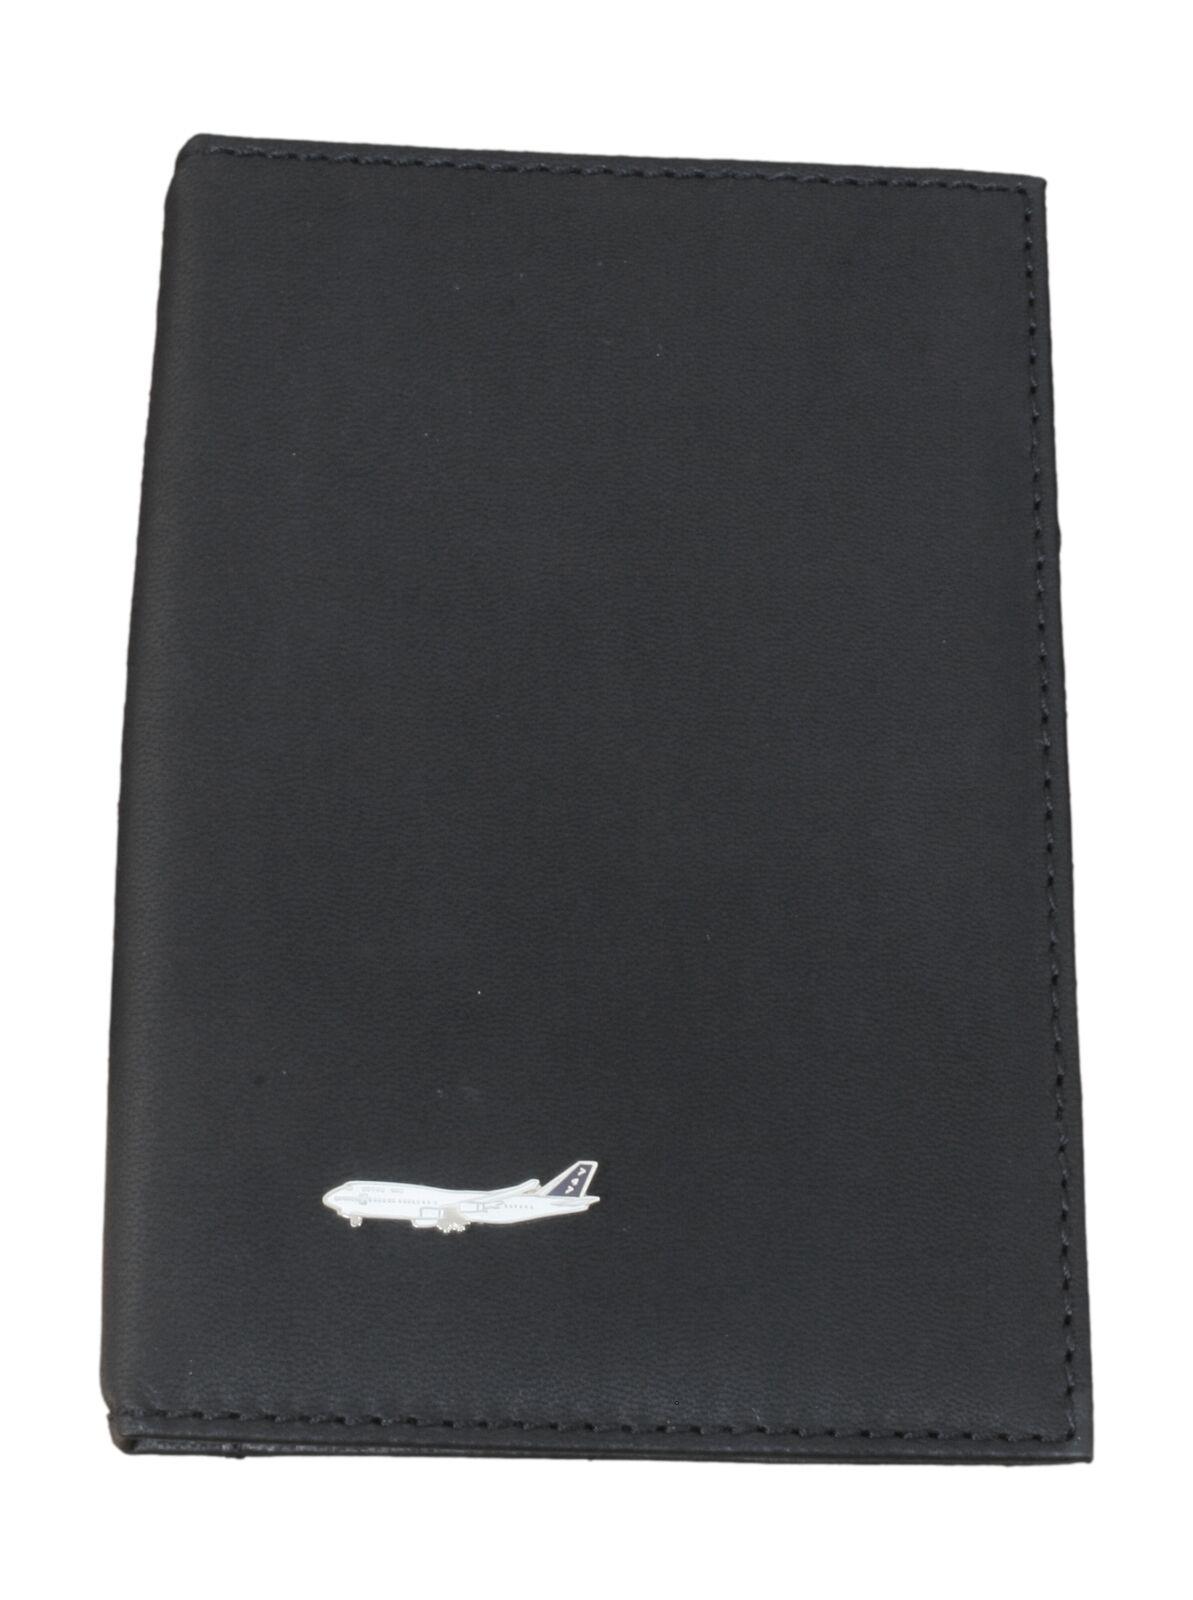 Boeing 747 Black Leather Shotgun/Firearms Certificate Holder 36